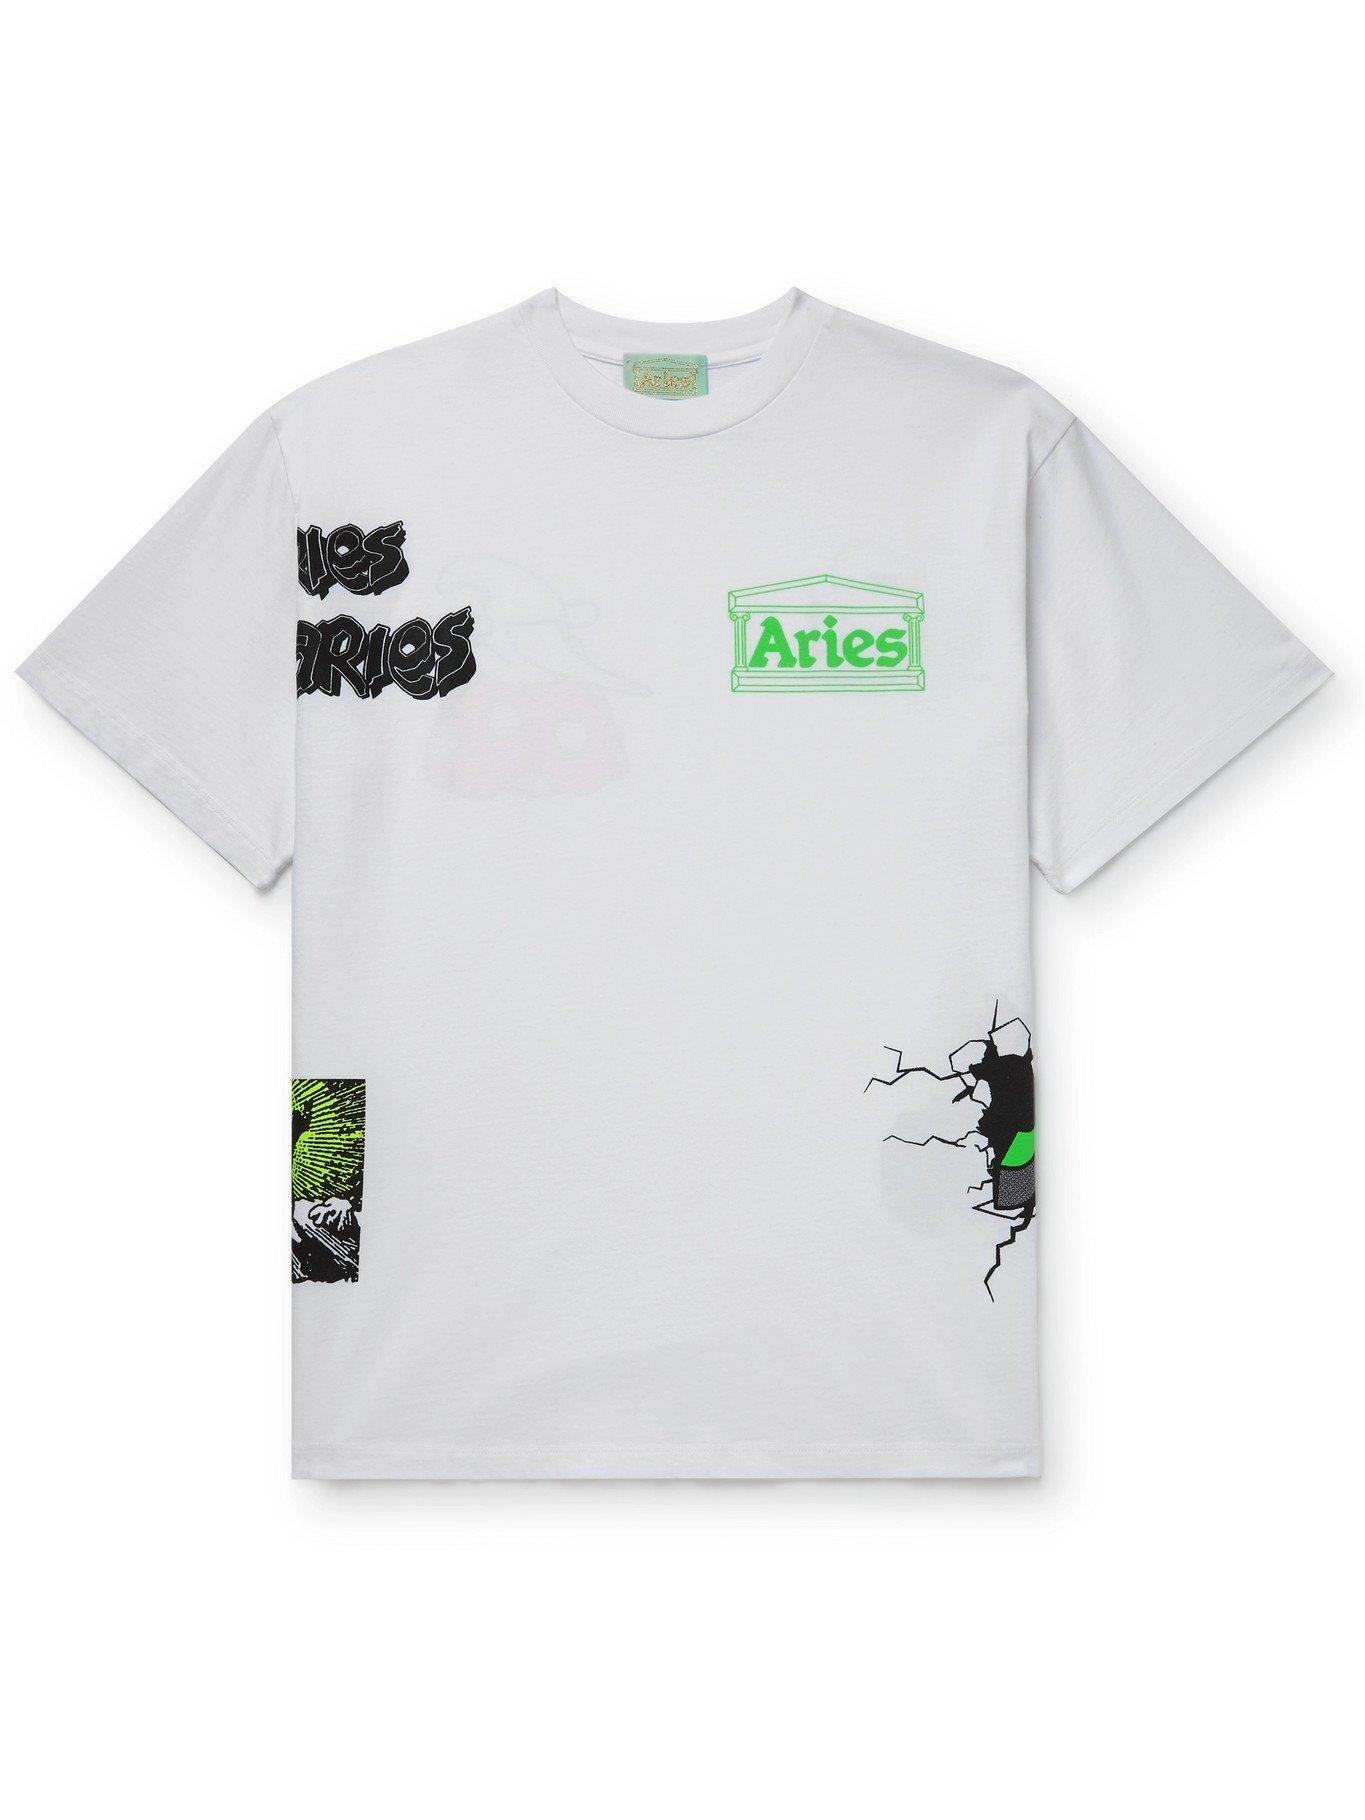 ARIES - Printed Cotton-Jersey T-Shirt - White - XL